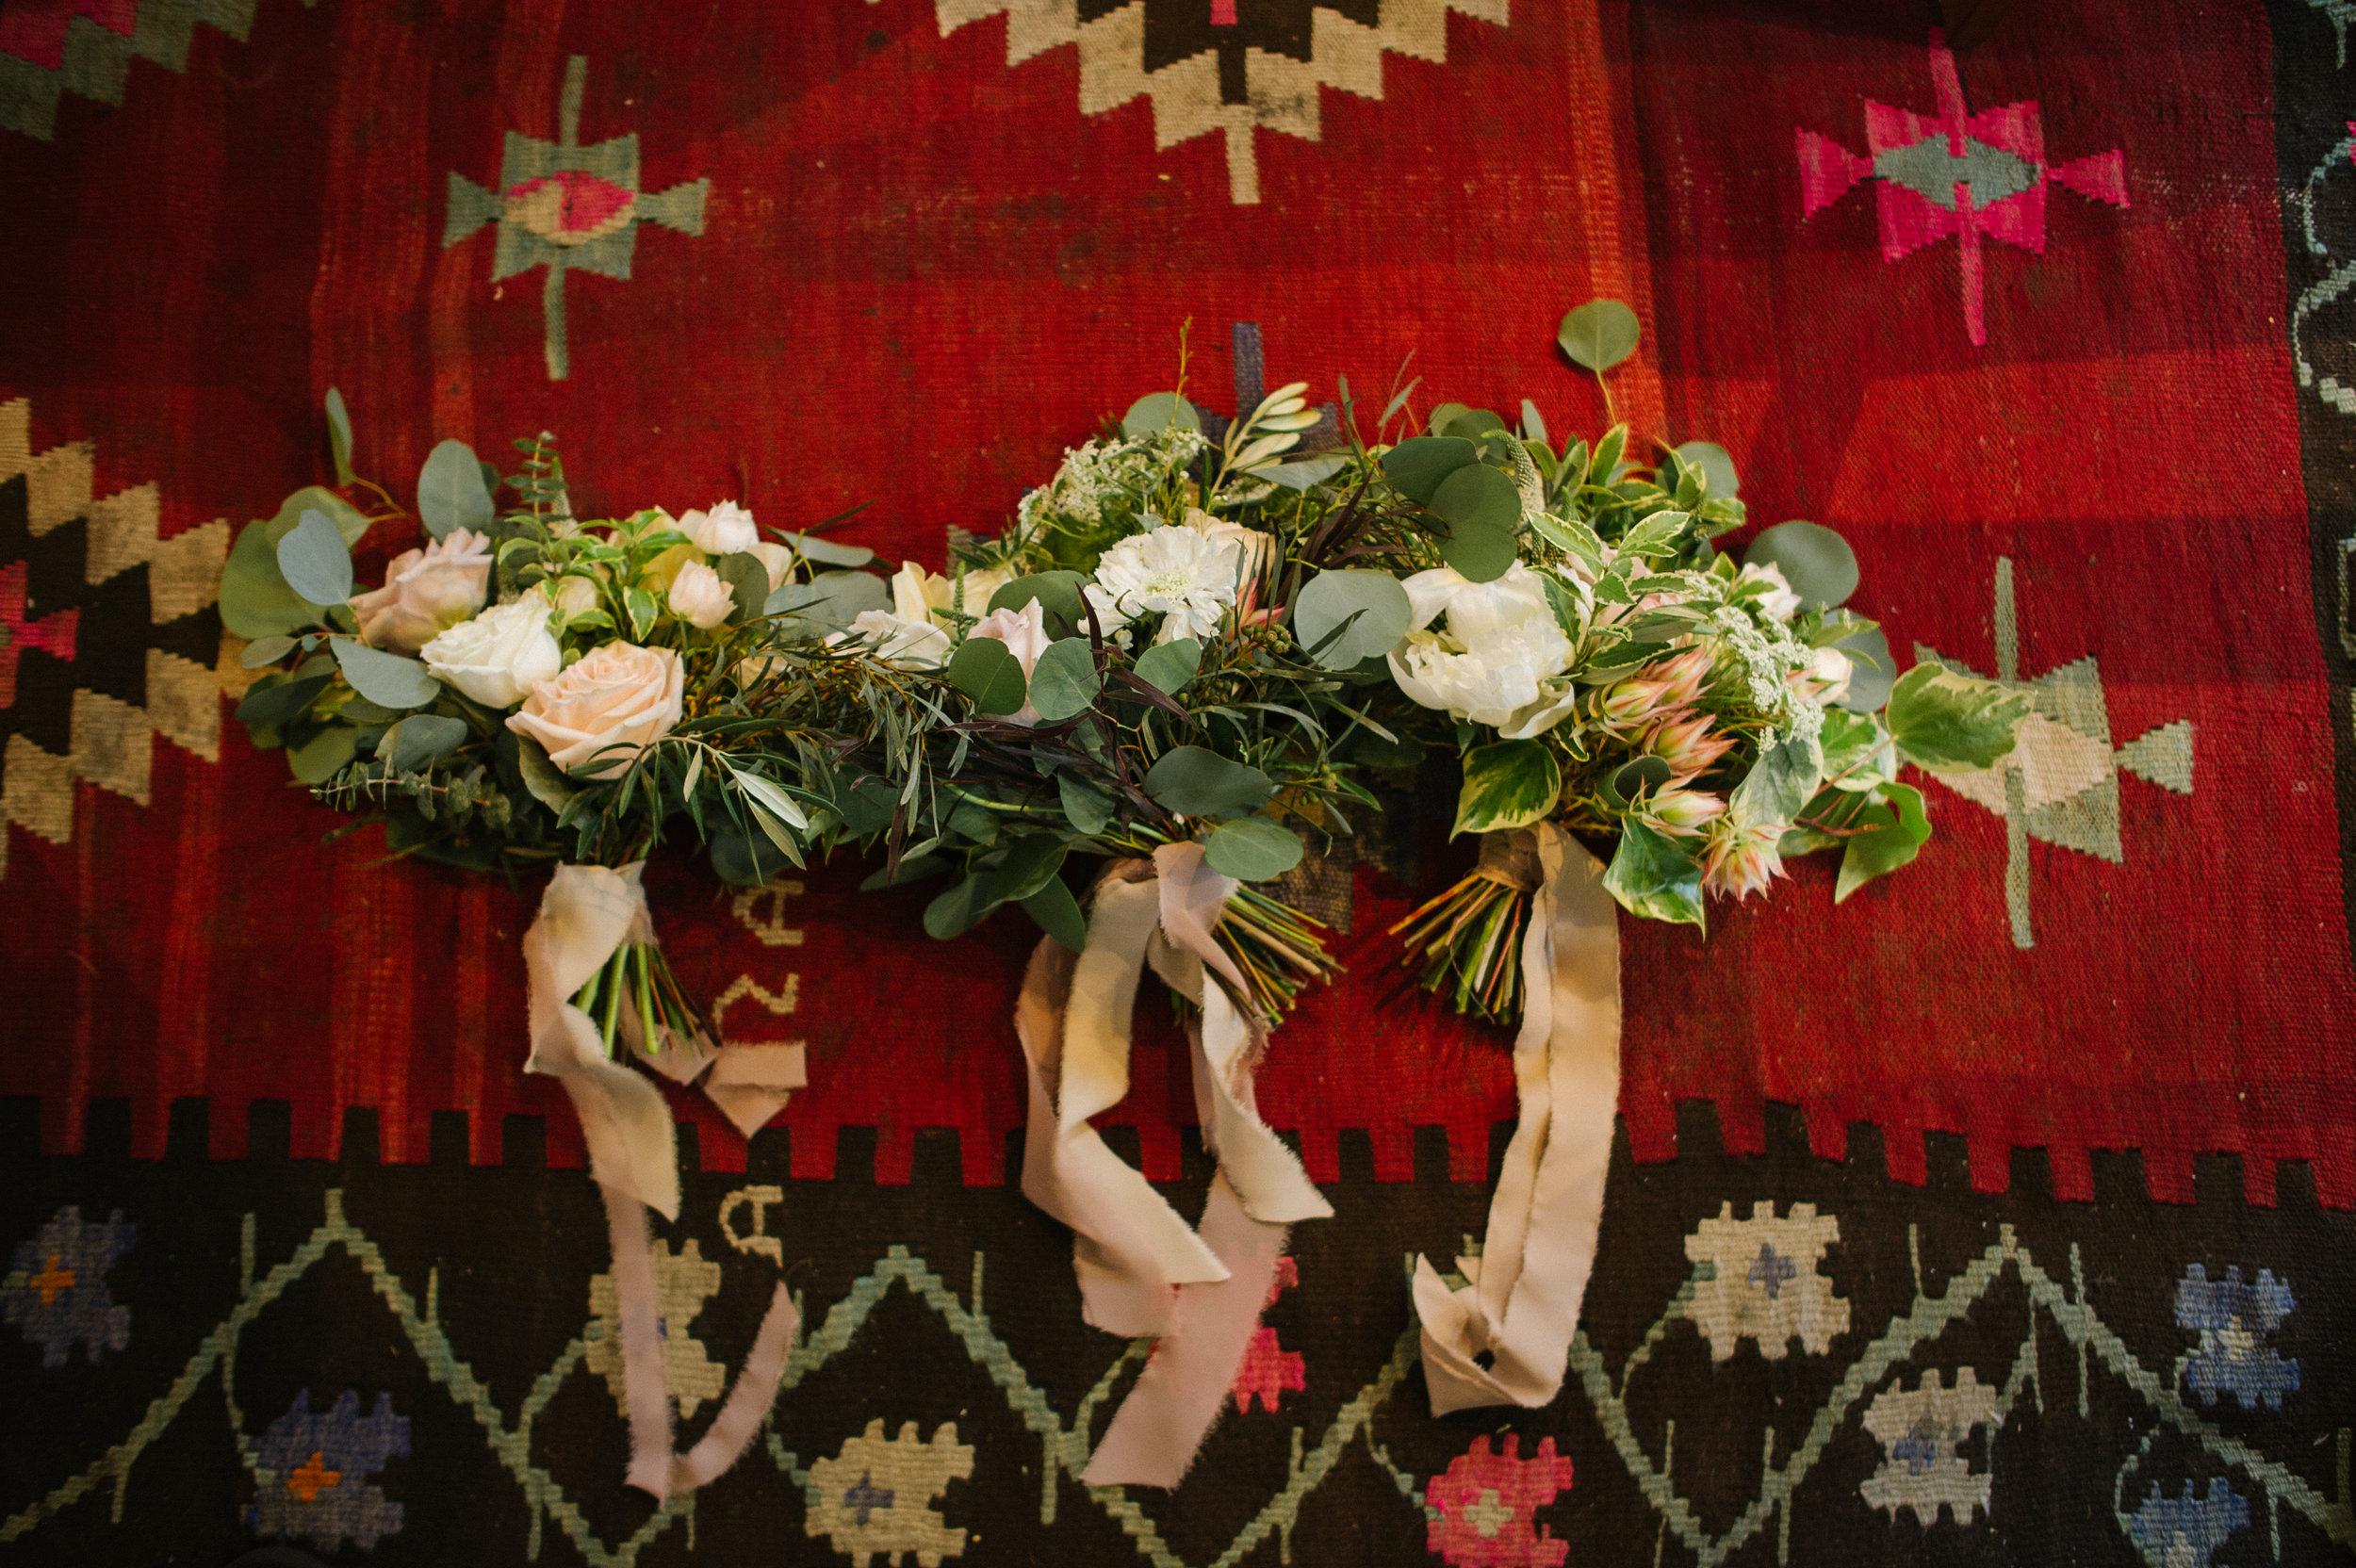 Calgary_Wedding_Photography_Bridgette_Bar_Bridesmaids_Shoot_2018_HR098.jpg